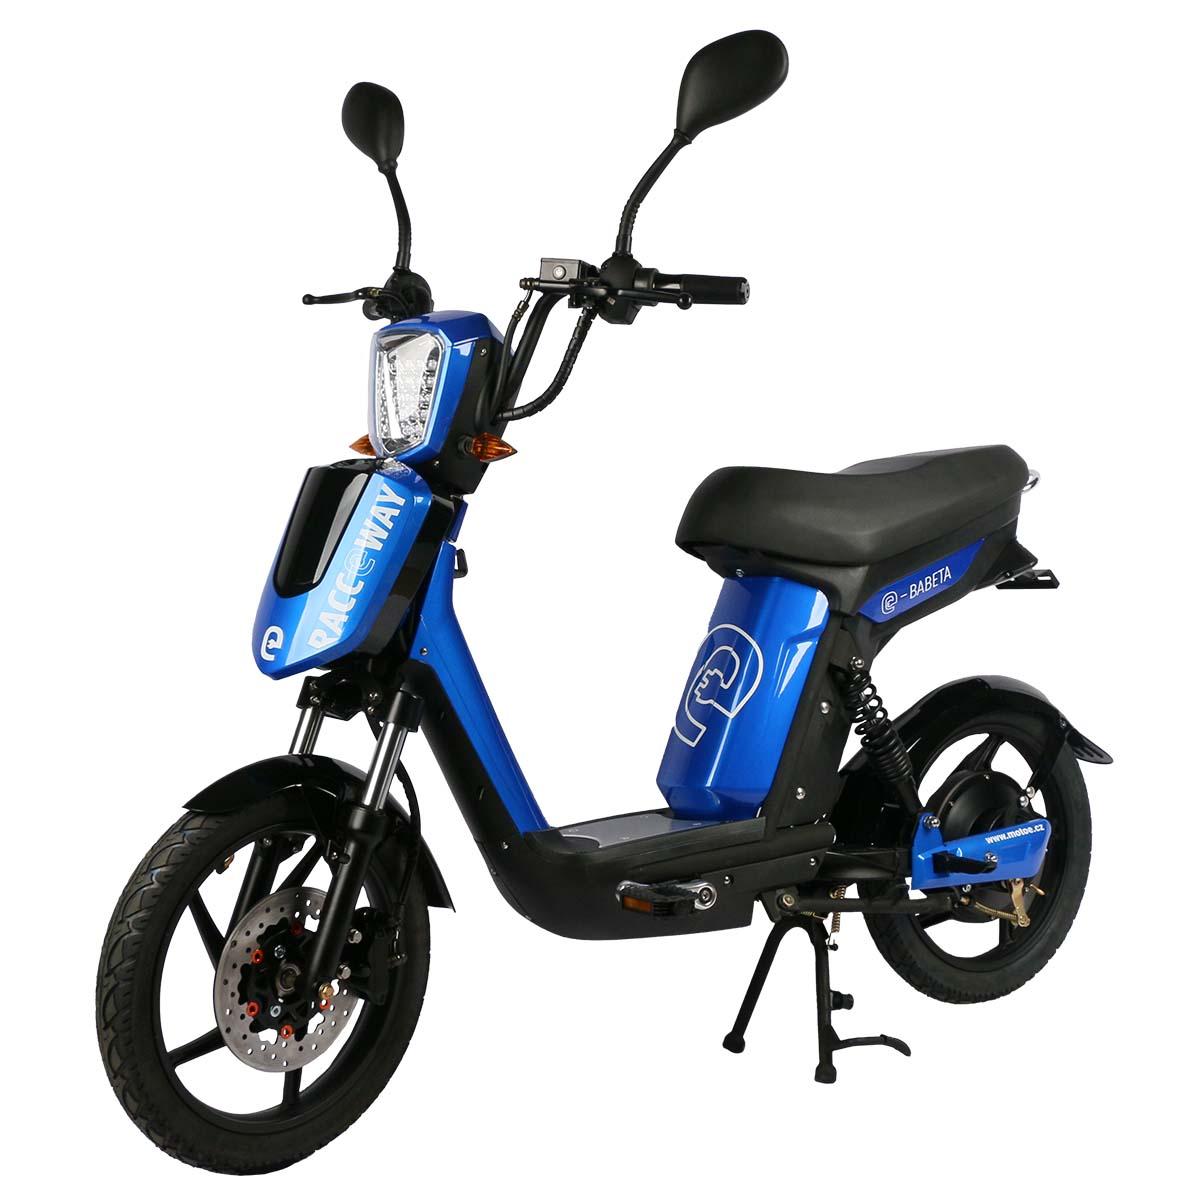 Elektrický motocykl RACCEWAY E-BABETA Barva: Modrá